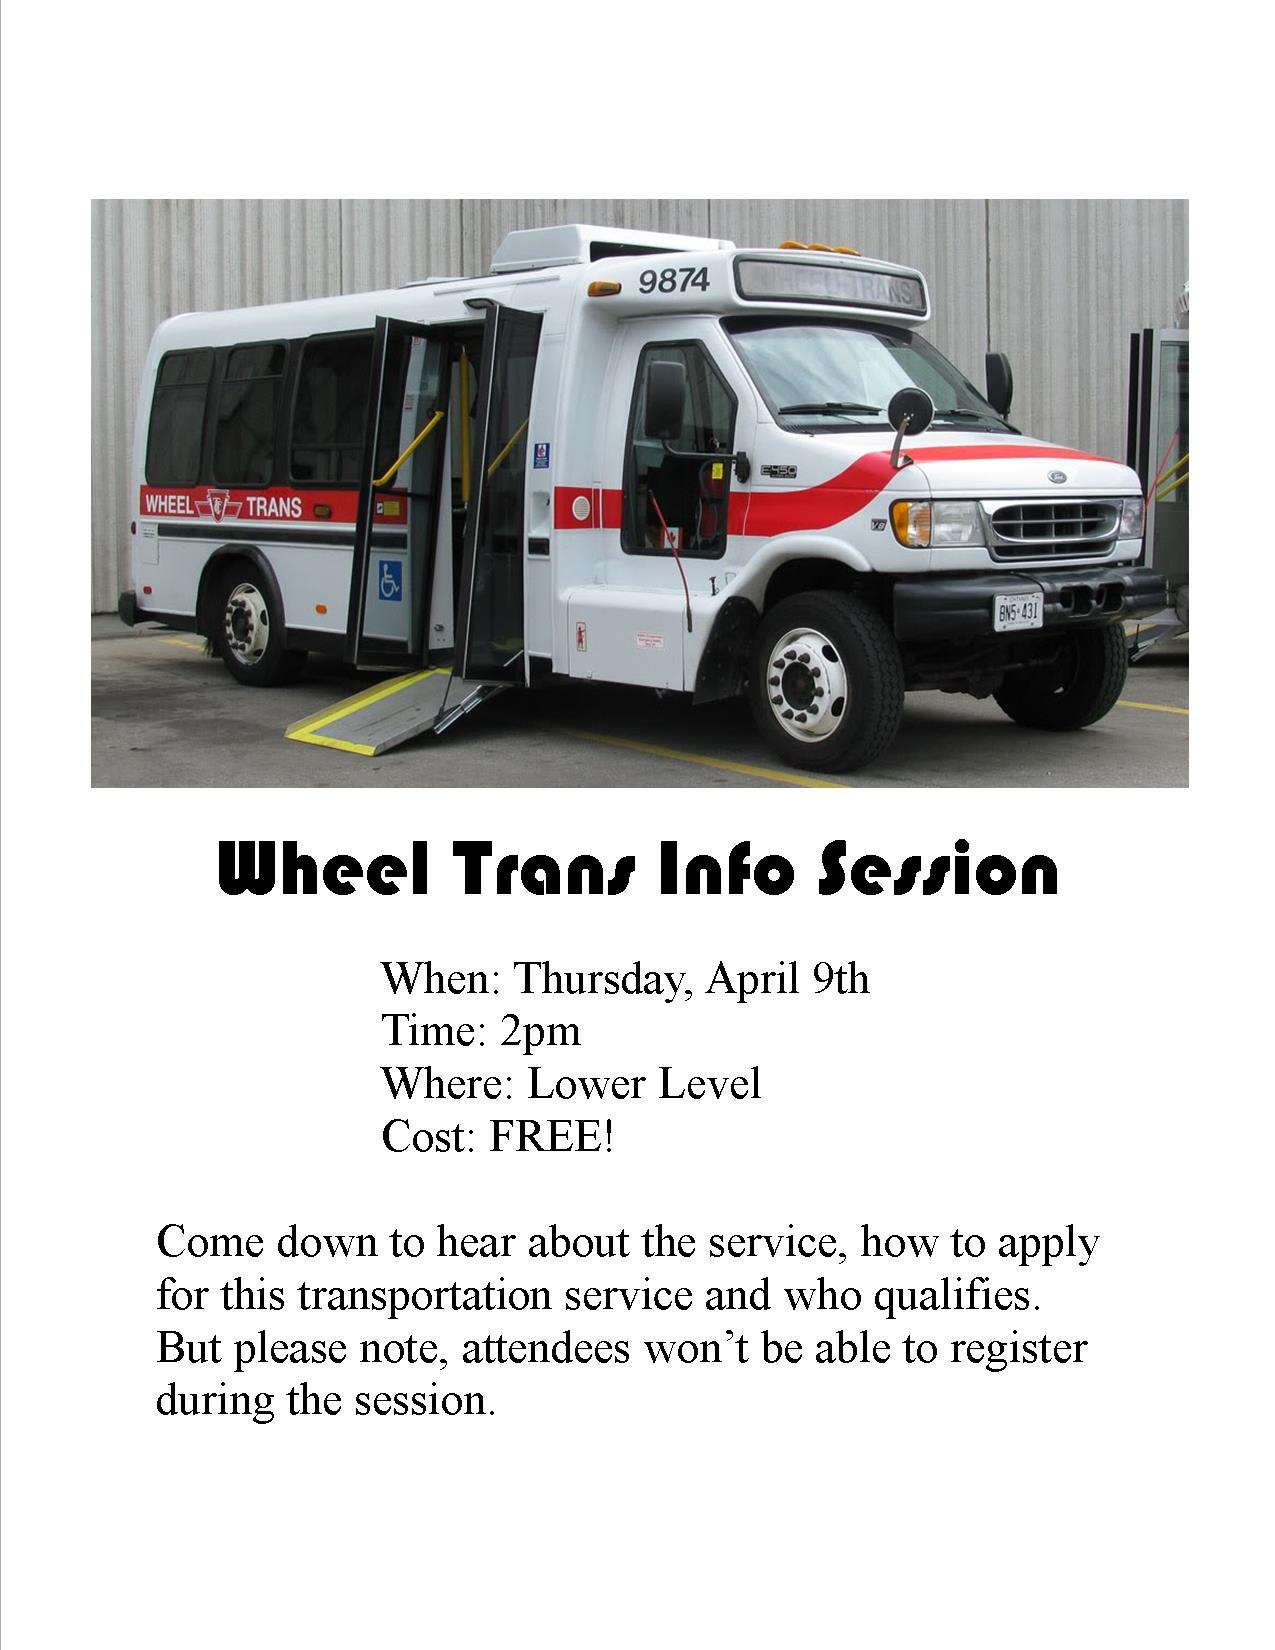 WheelTrans seminar